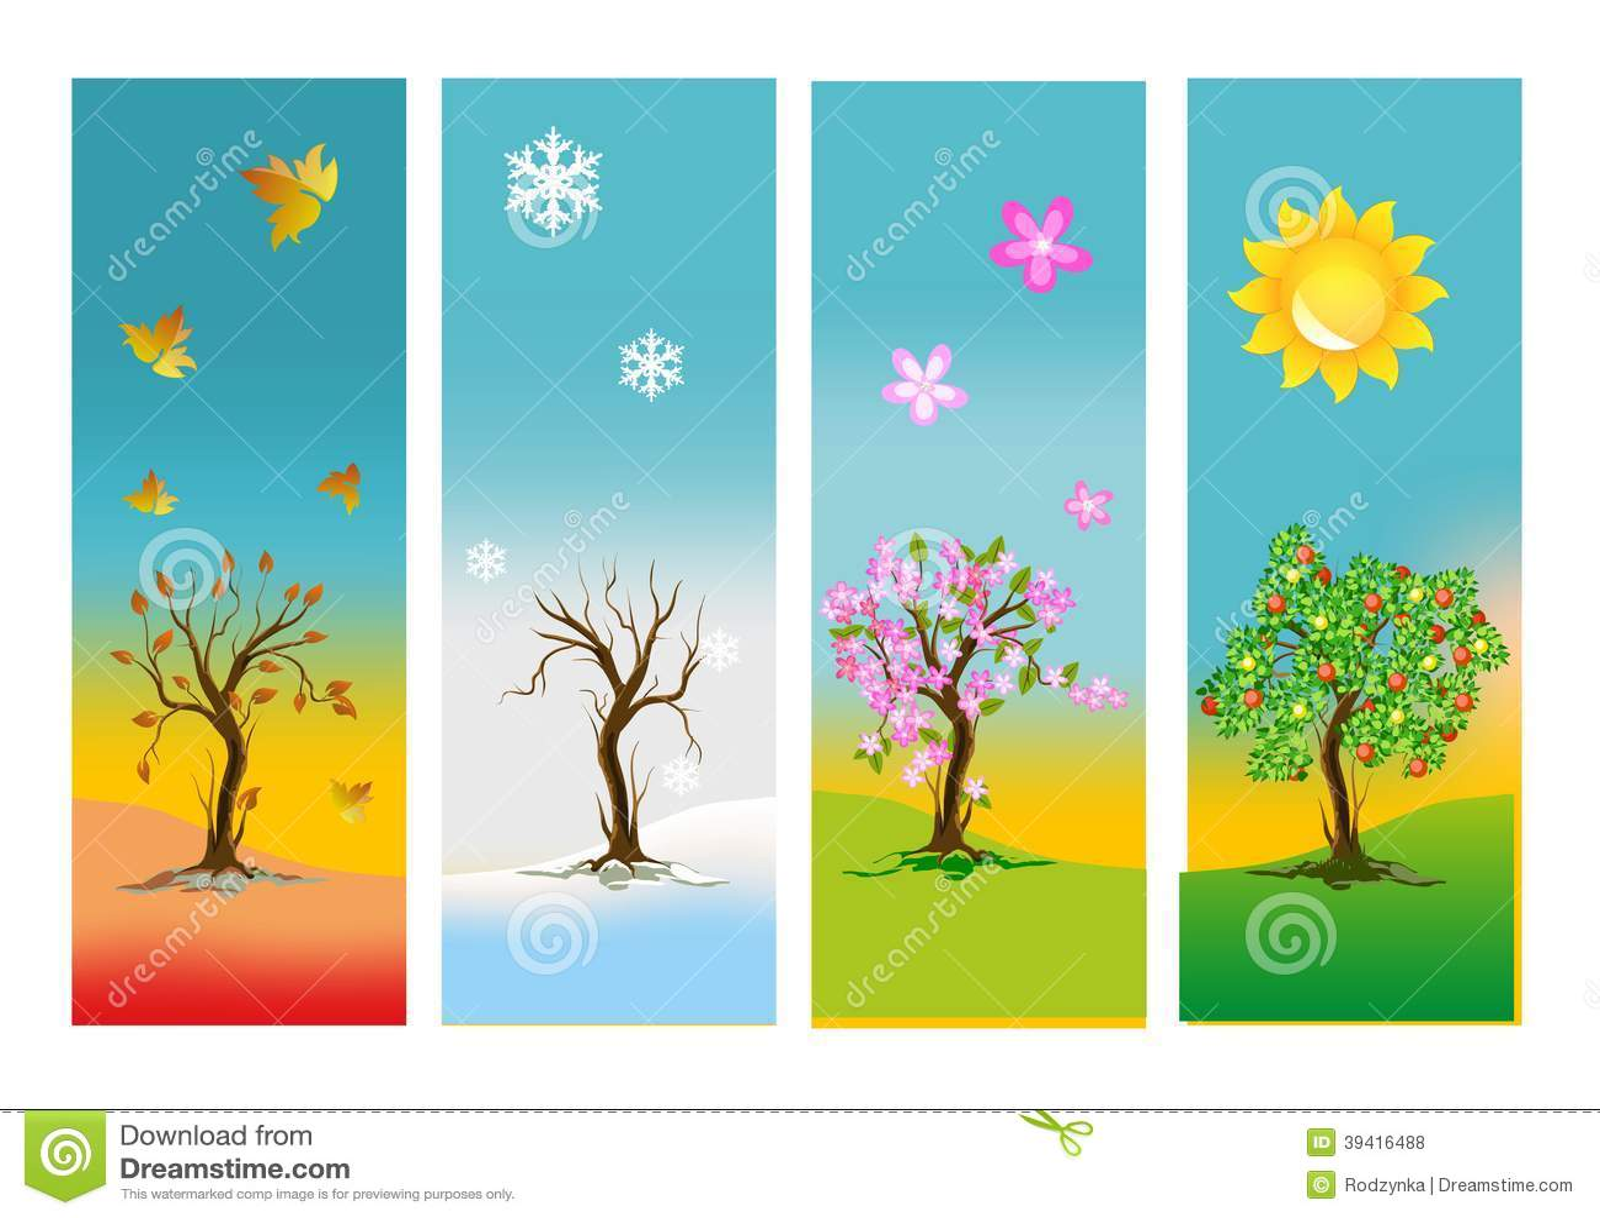 les quatre saisons illustration stock illustration du nature 39416488. Black Bedroom Furniture Sets. Home Design Ideas